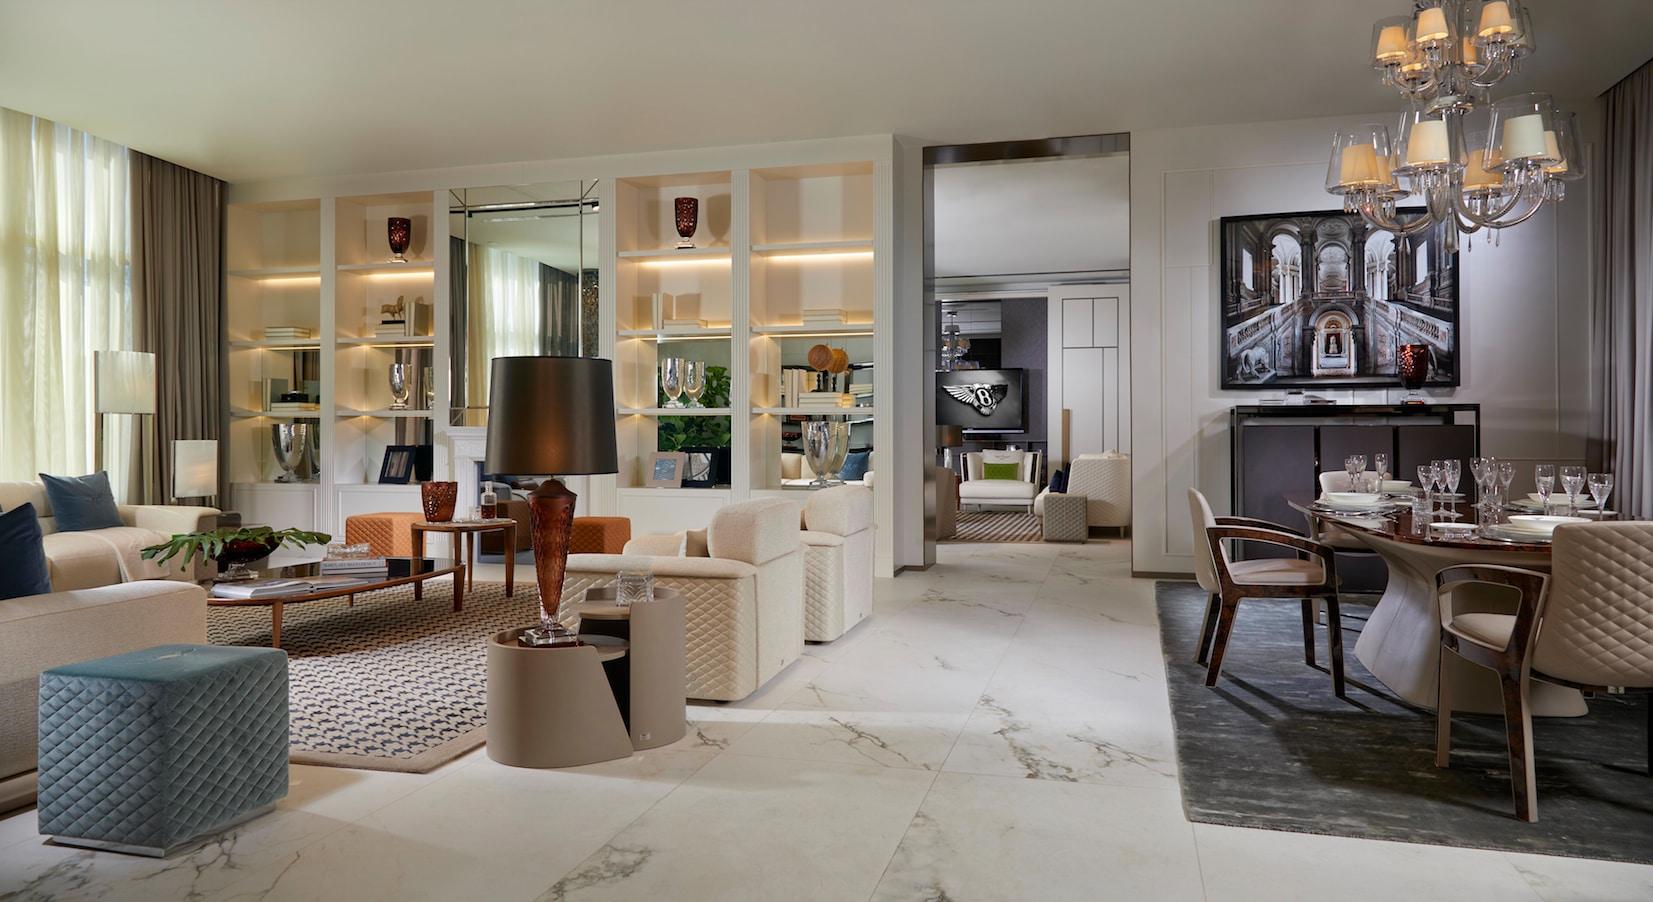 Luxury living group a miami interni magazine for Luxury living group